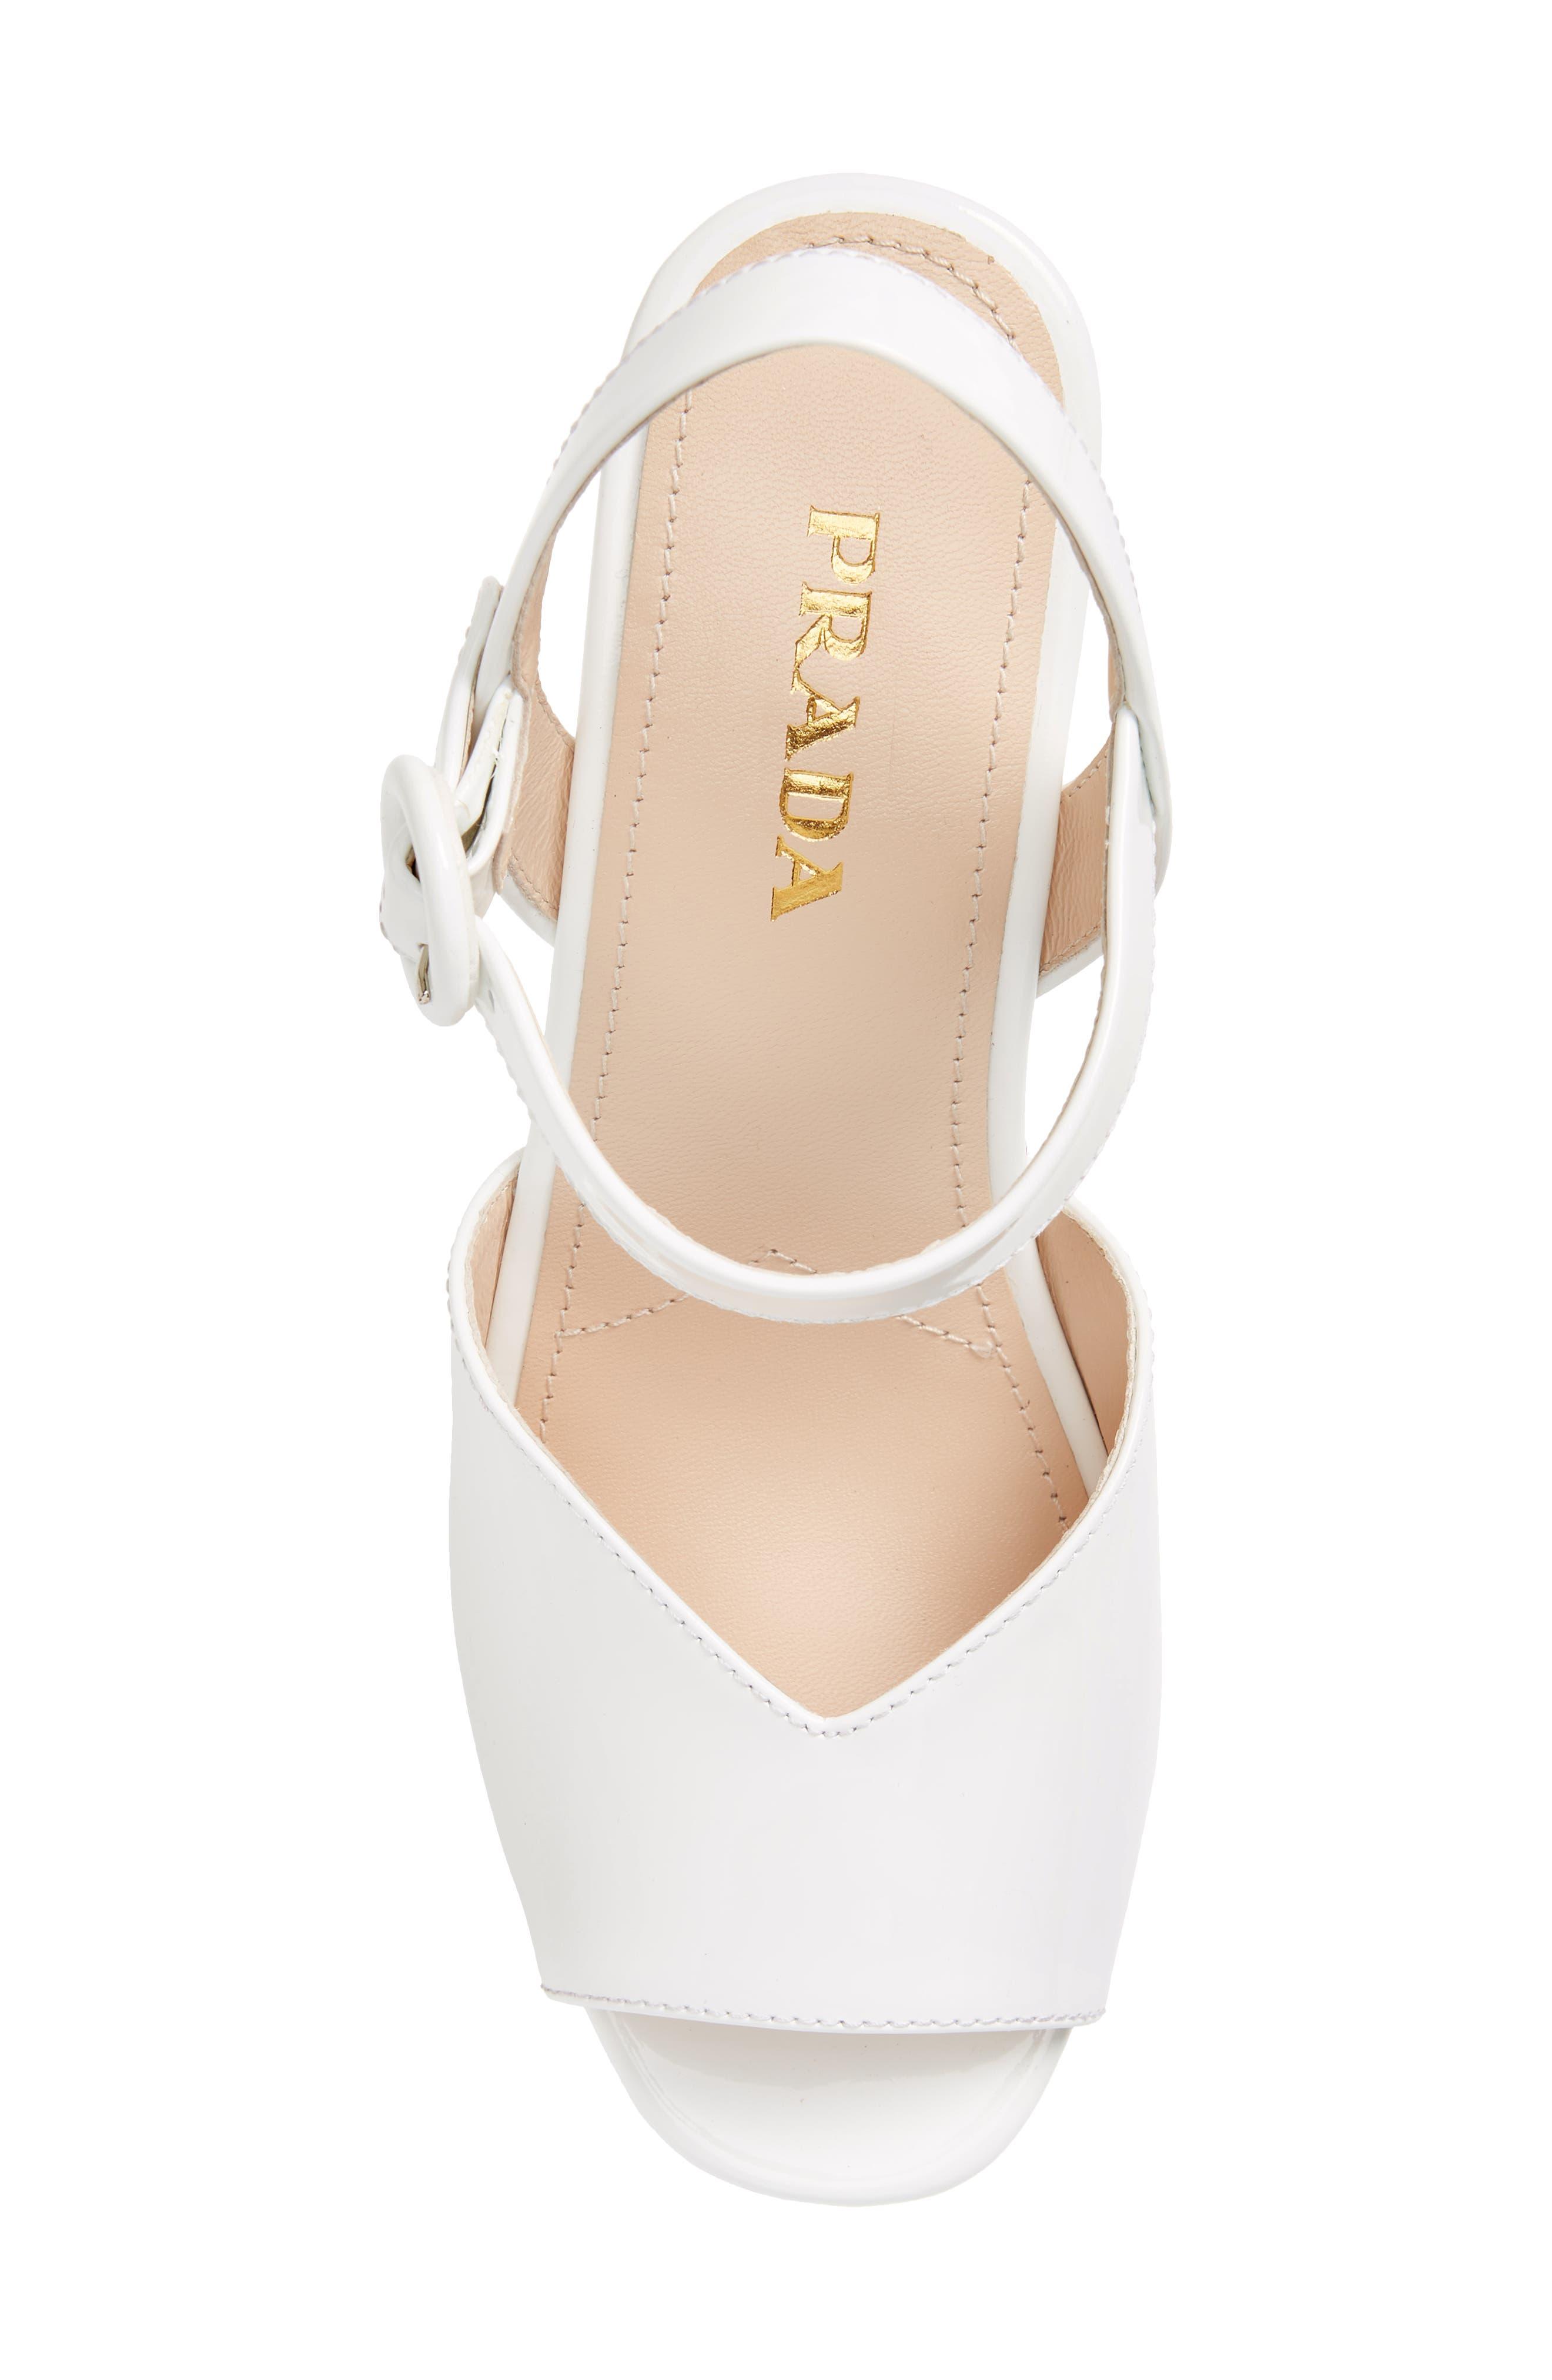 Wedge Platform Sandal,                             Alternate thumbnail 5, color,                             WHITE PATENT